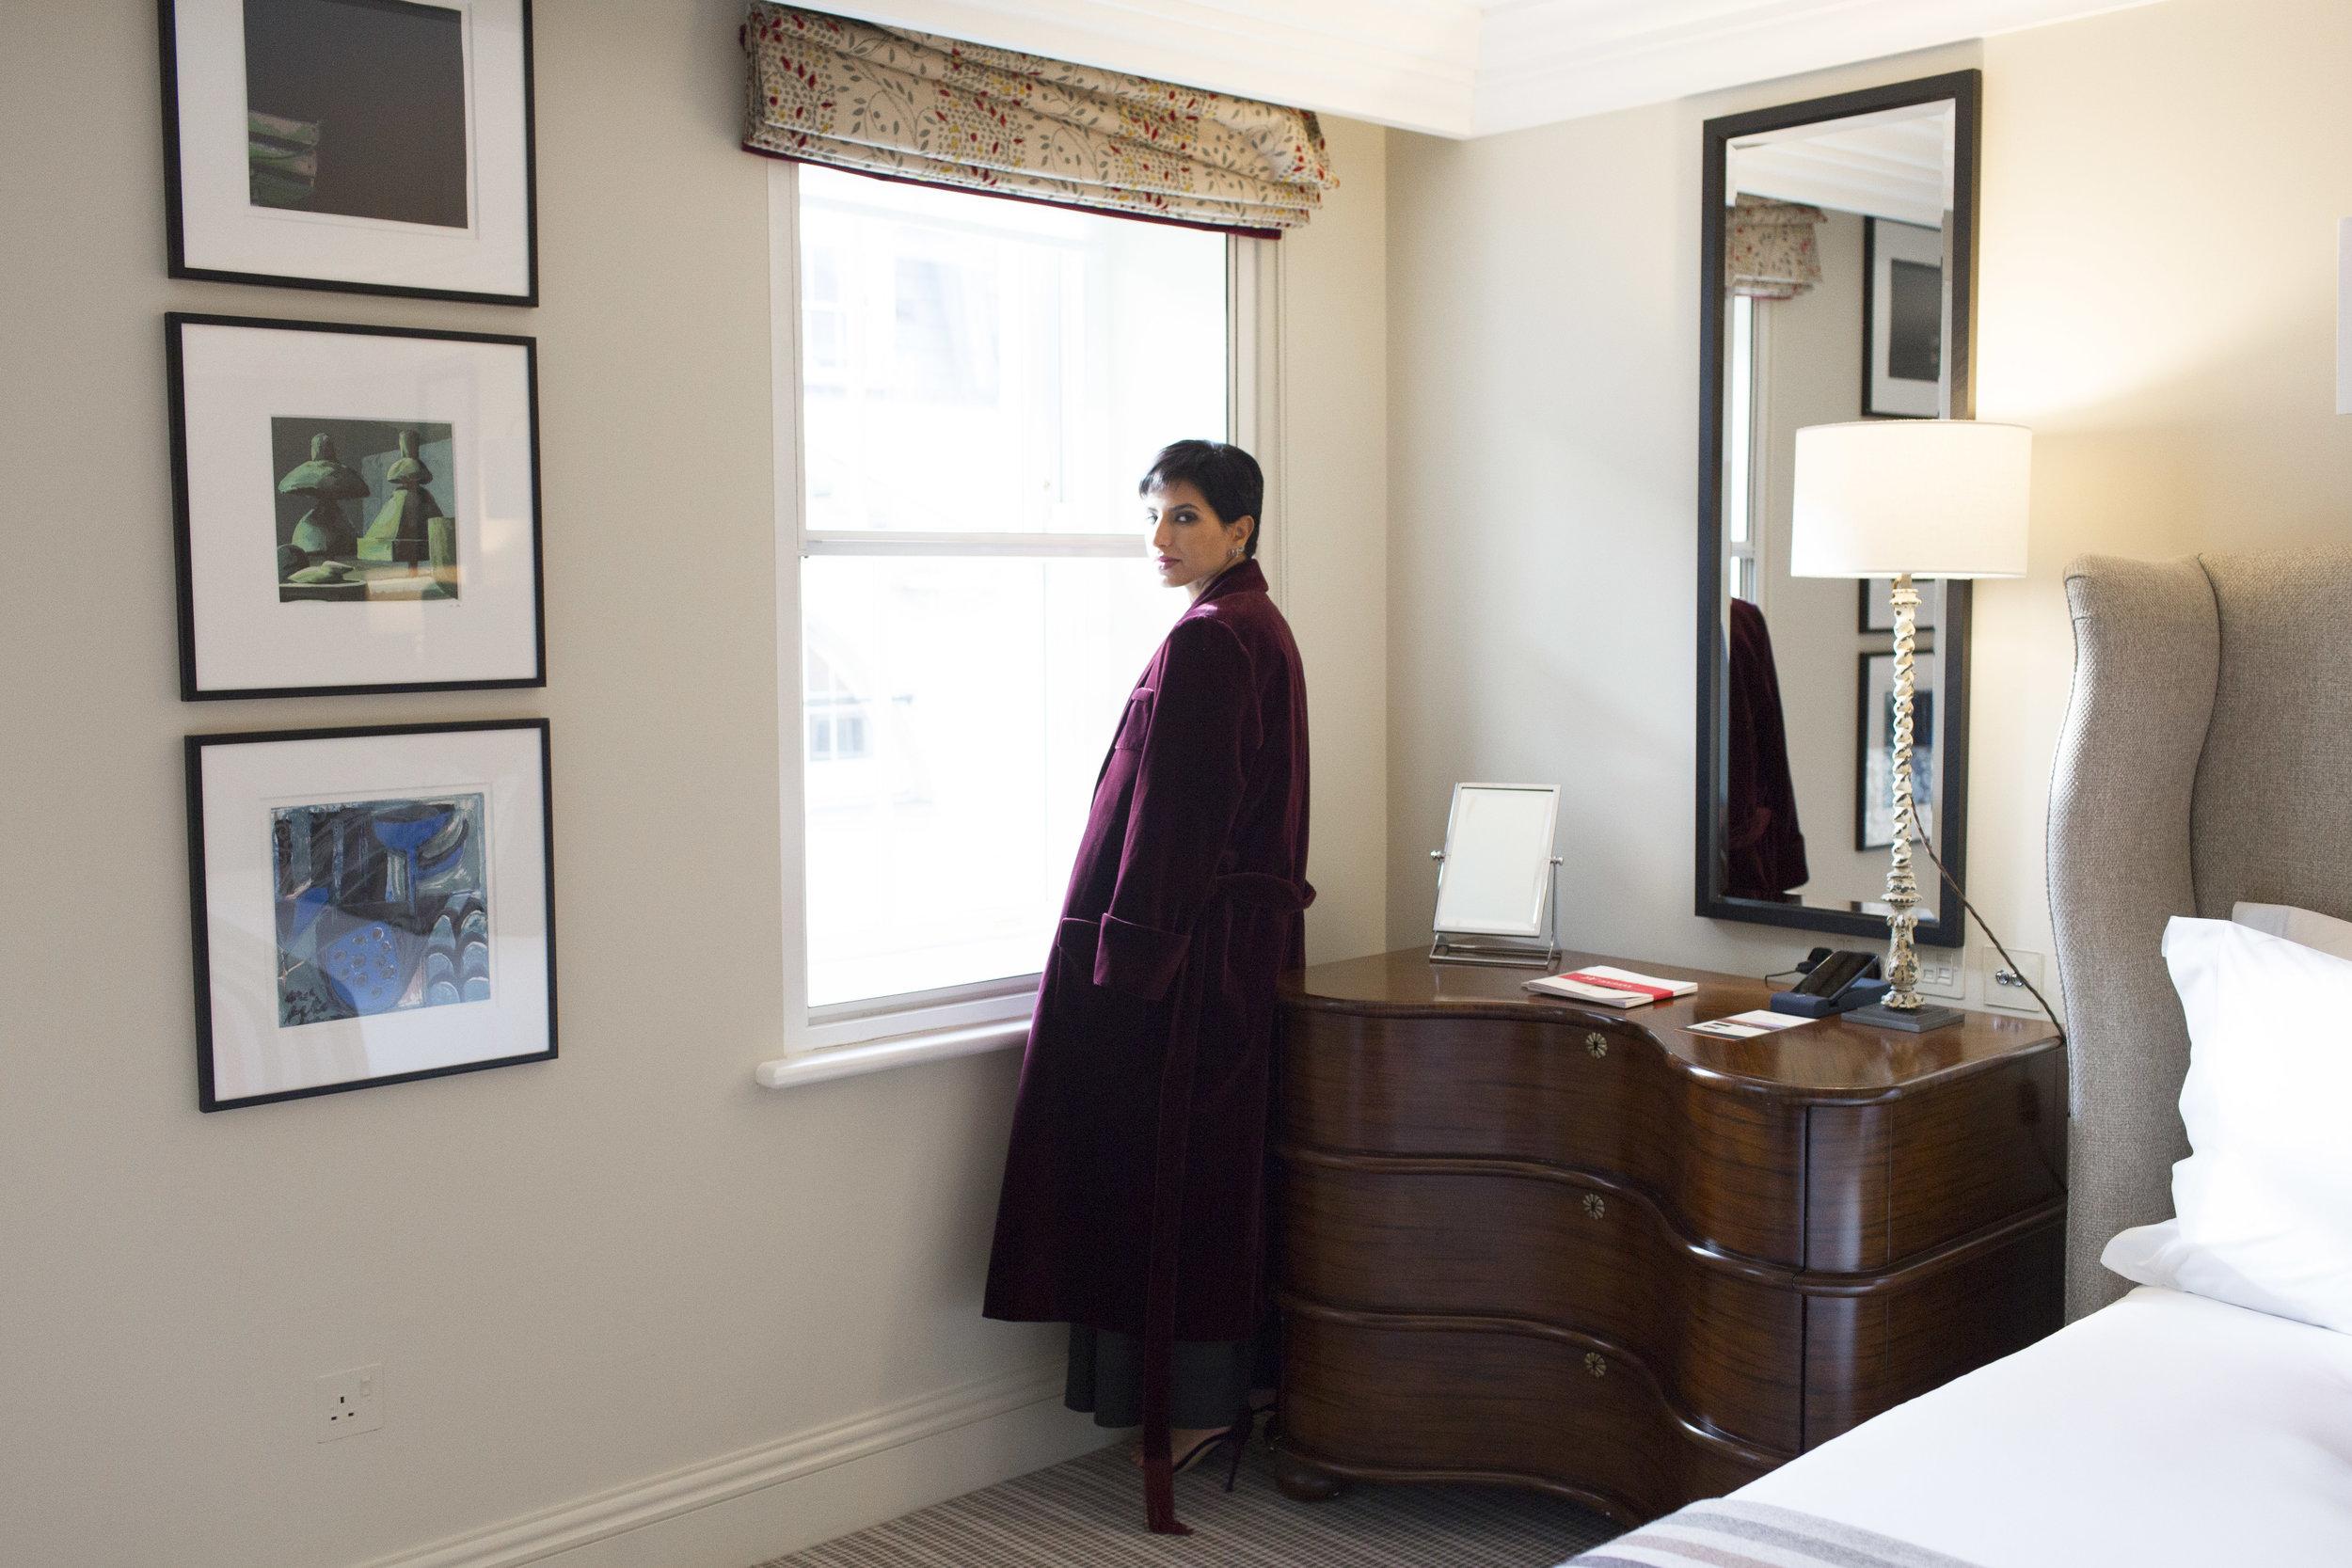 Princess Deena Aljuhani Abdulaziz for The New York Times